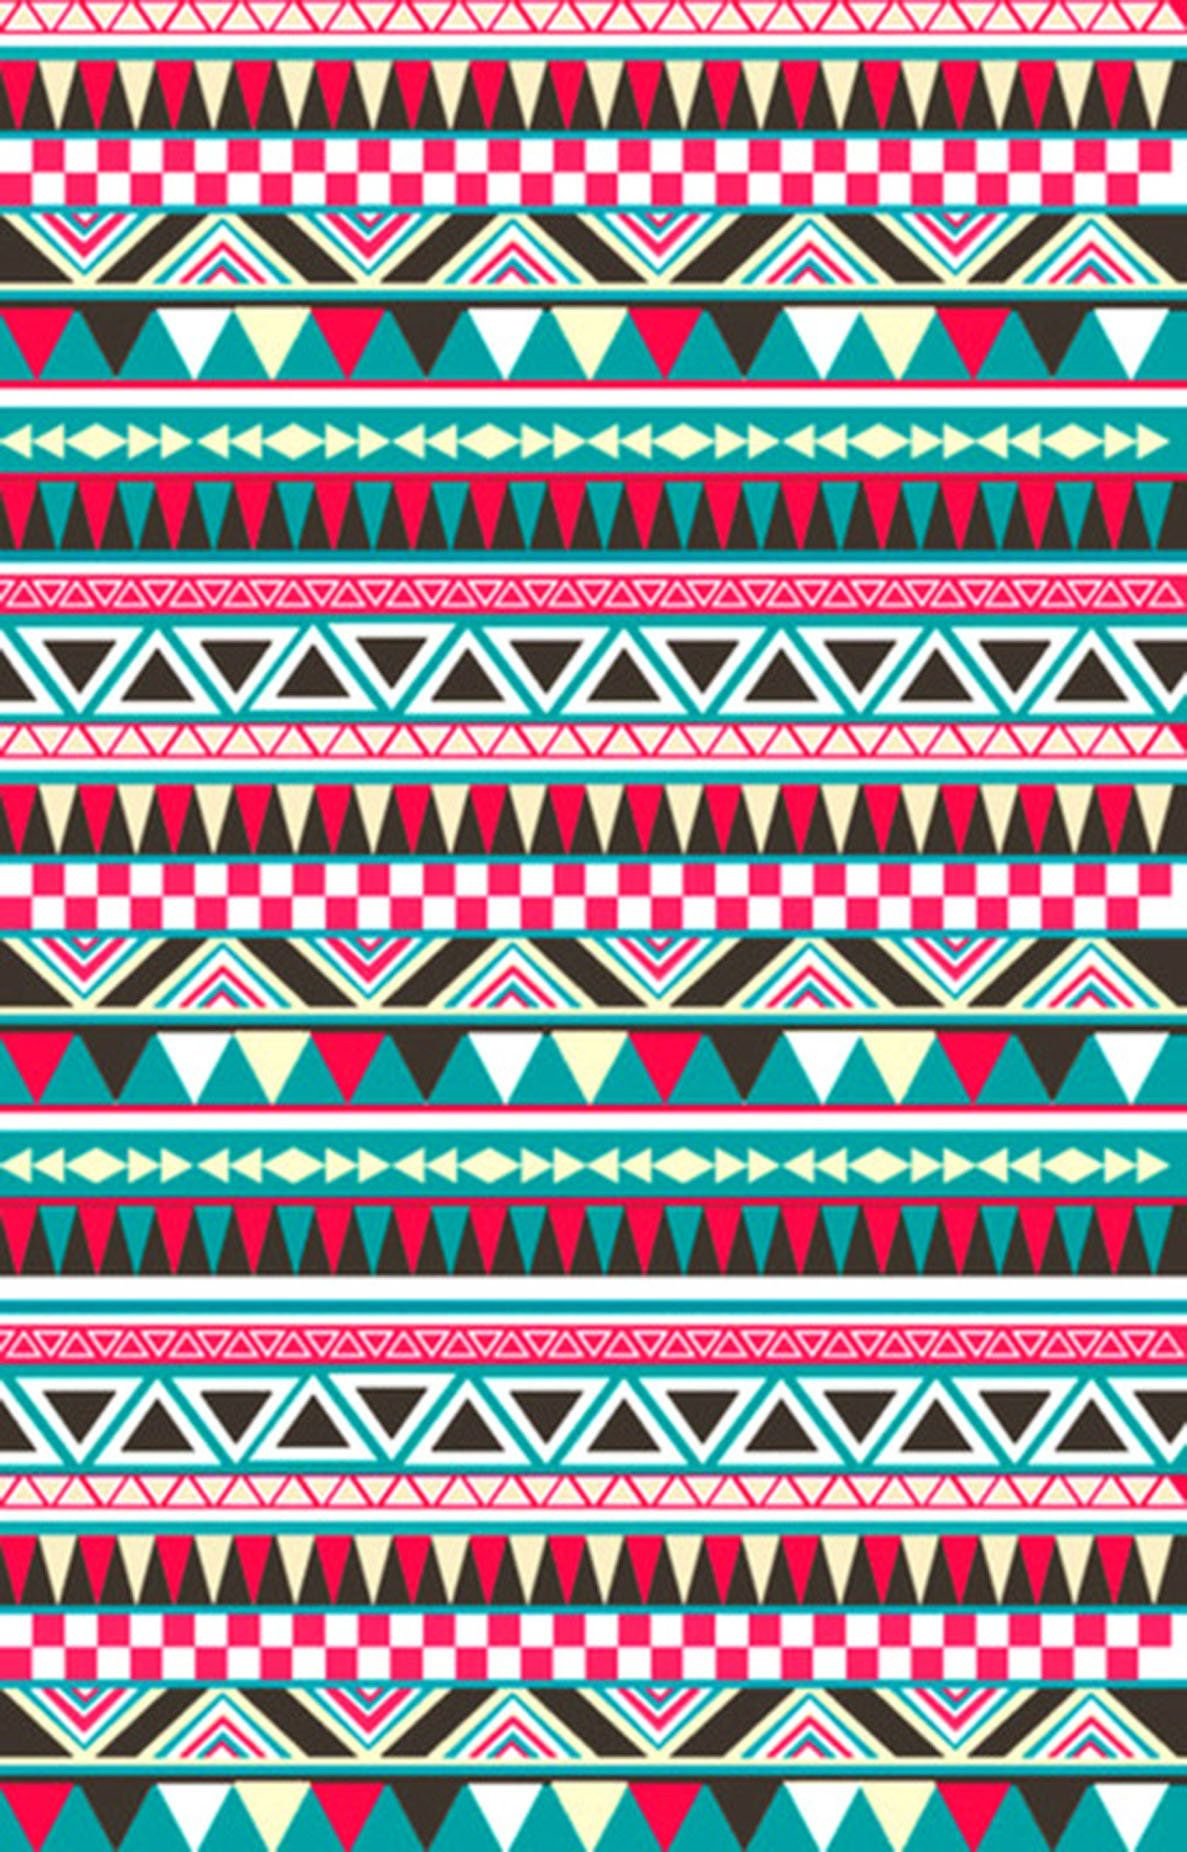 Original Jpg 1187 1852 Aztec Pattern Wallpaper Aztec Wallpaper Tribal Wallpaper